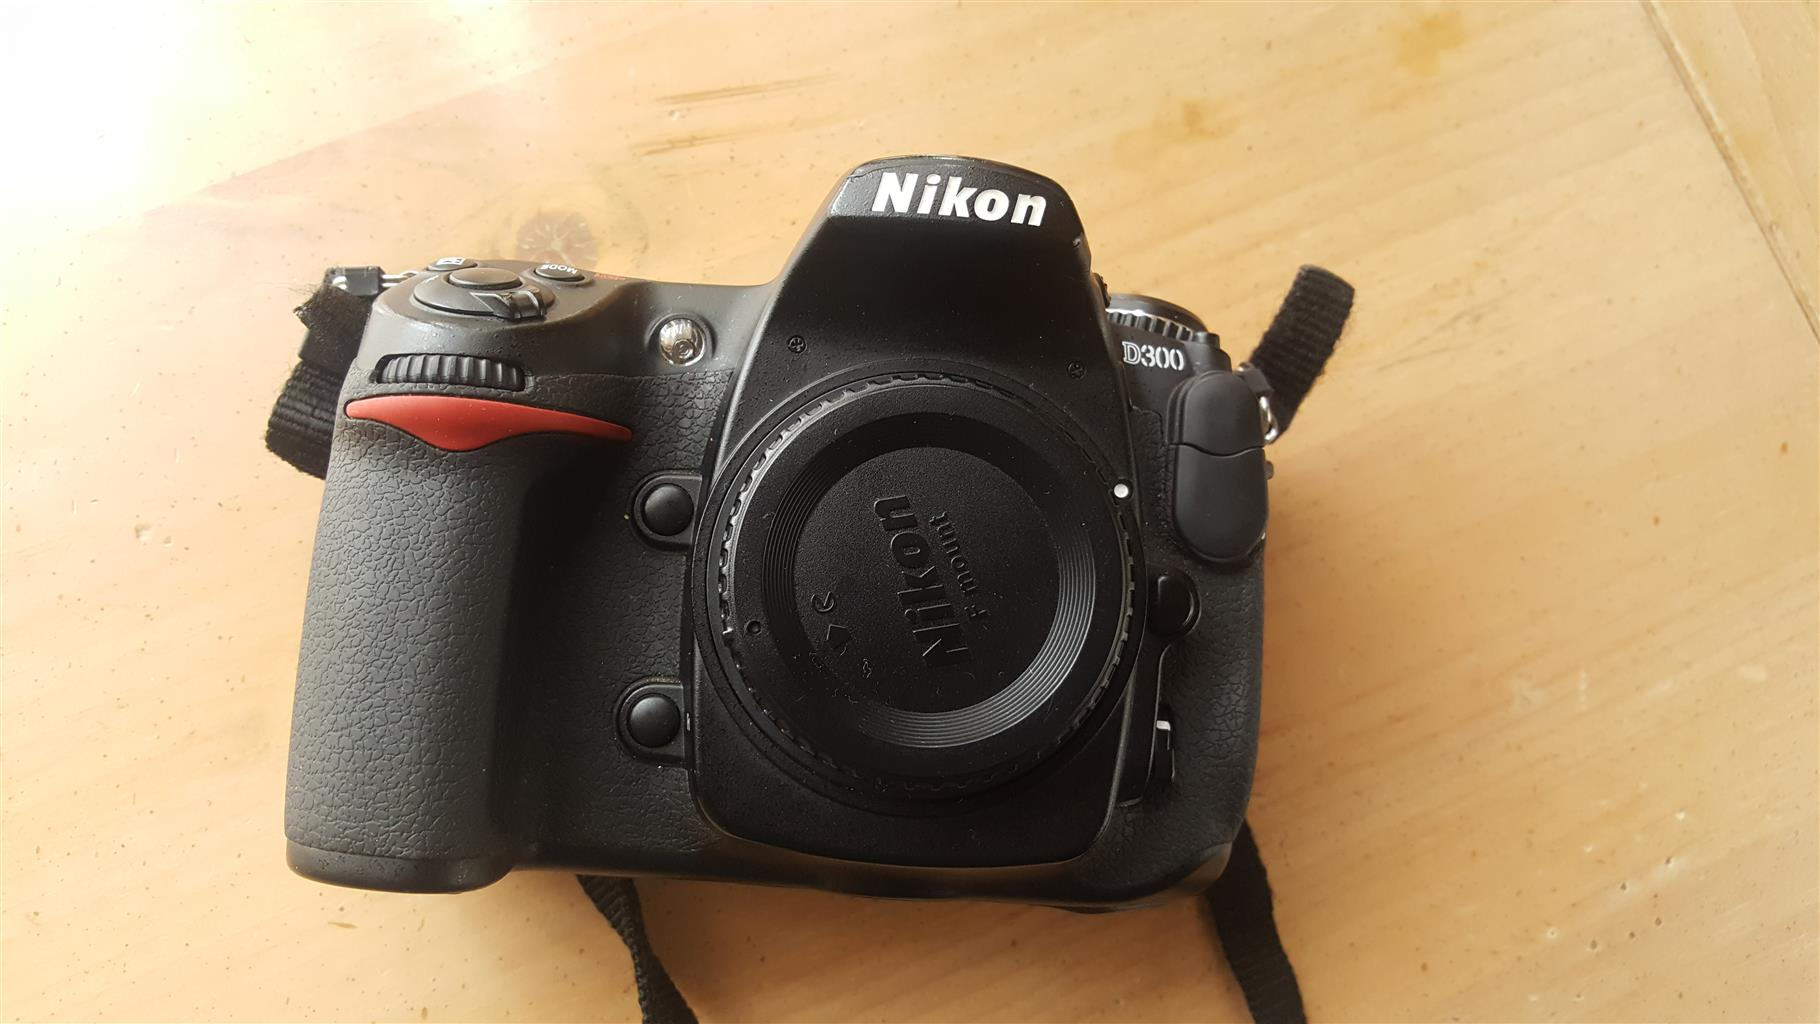 Nikon D300 camera body